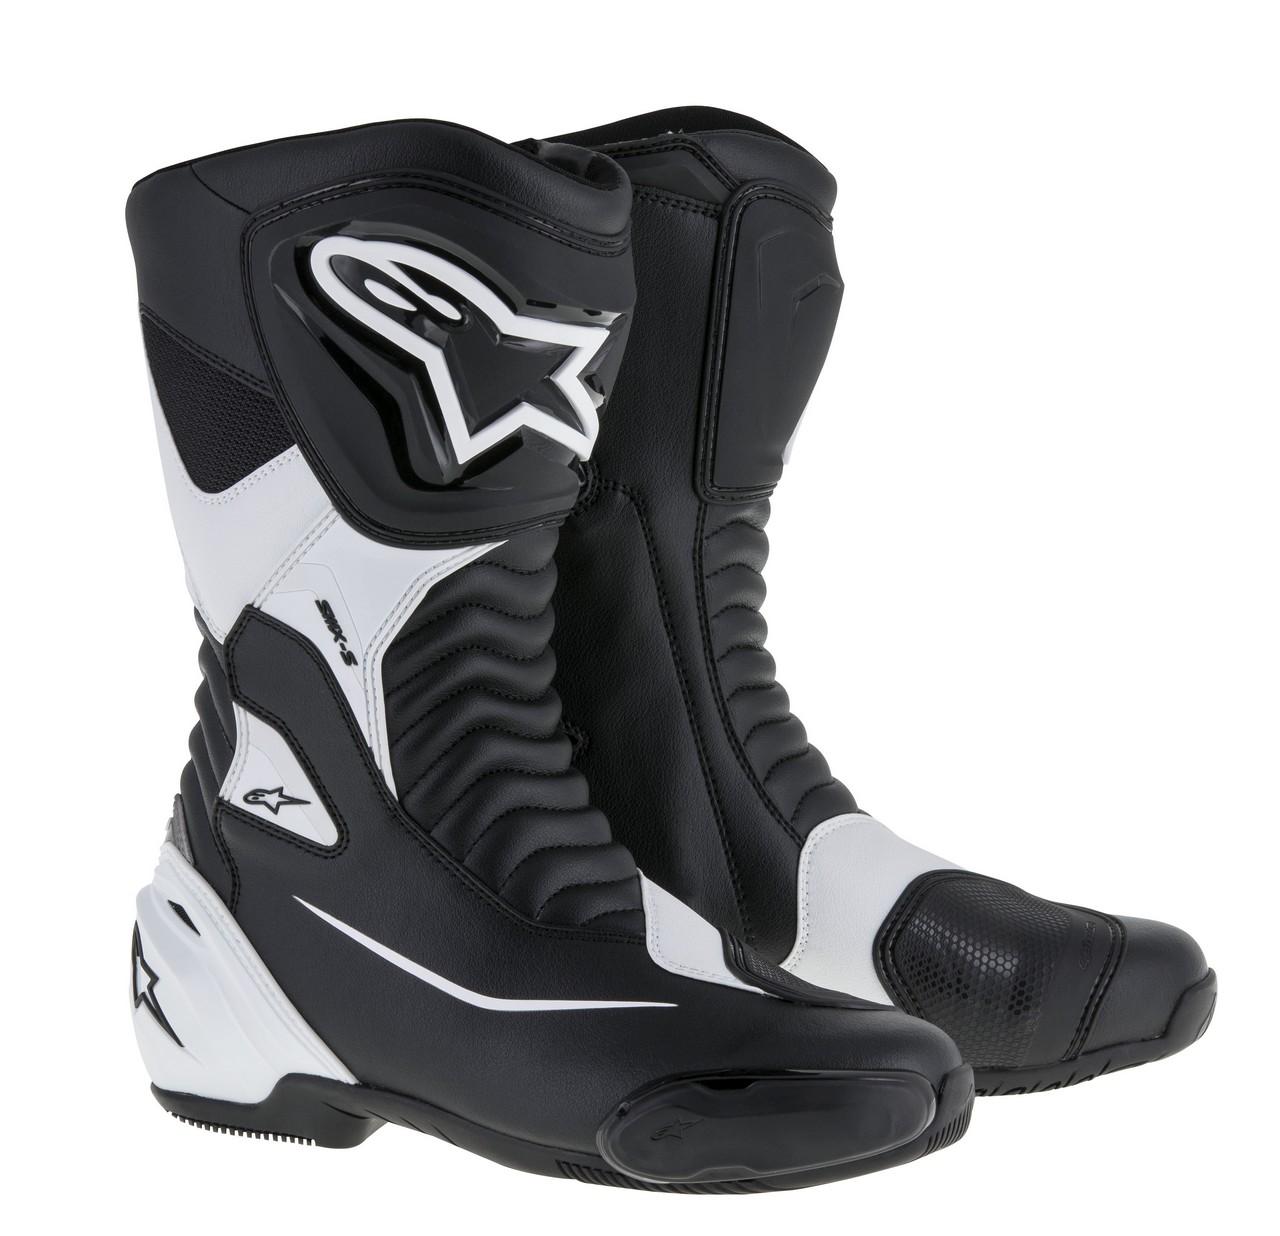 SMX-S BOOT alpinestars